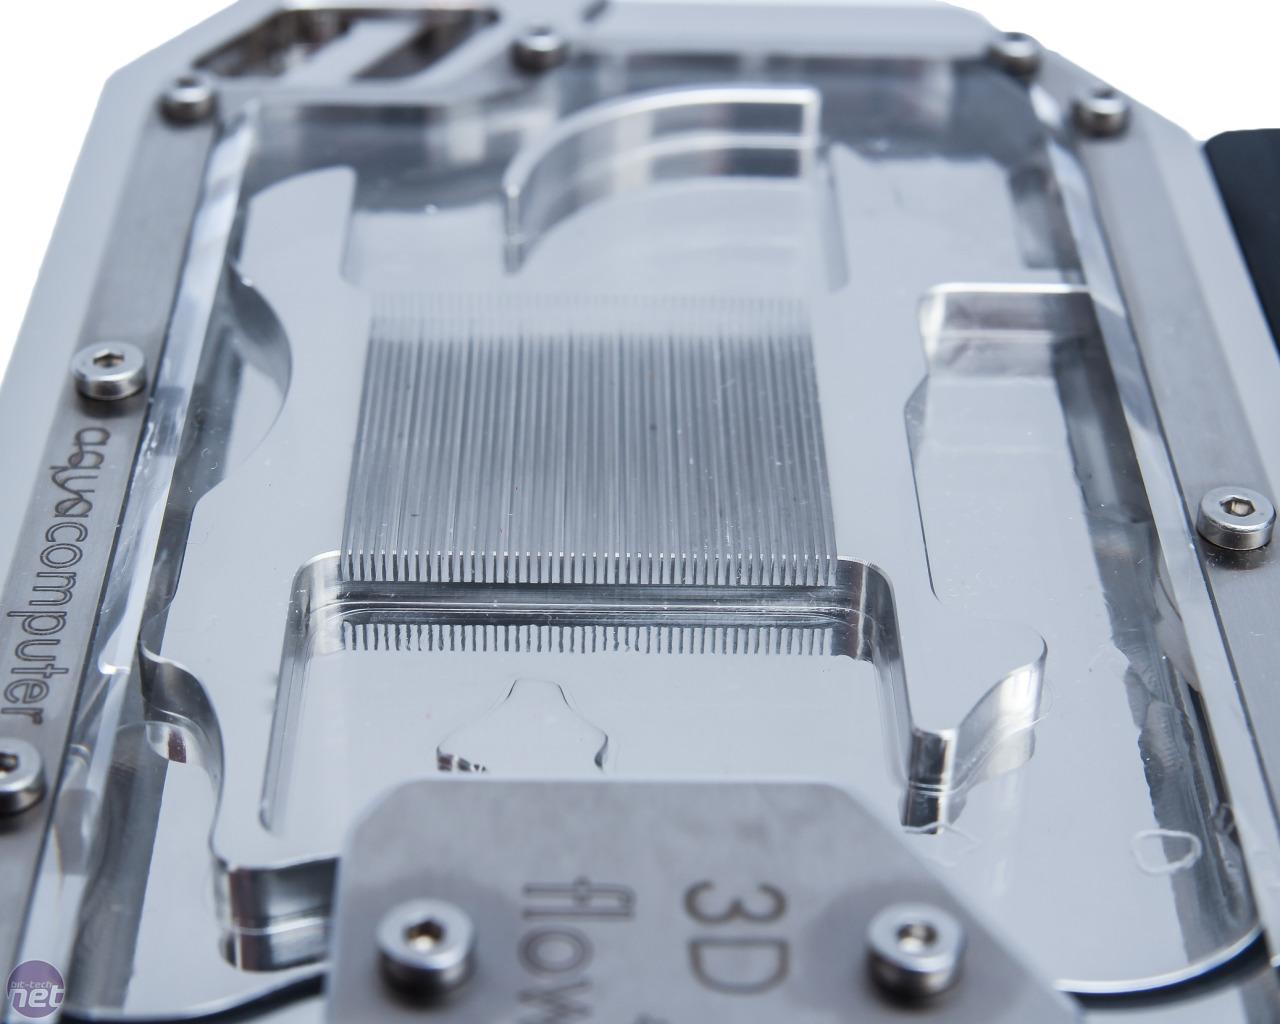 Water Cooling The Amd Radeon R9 290x Bit Tech Net